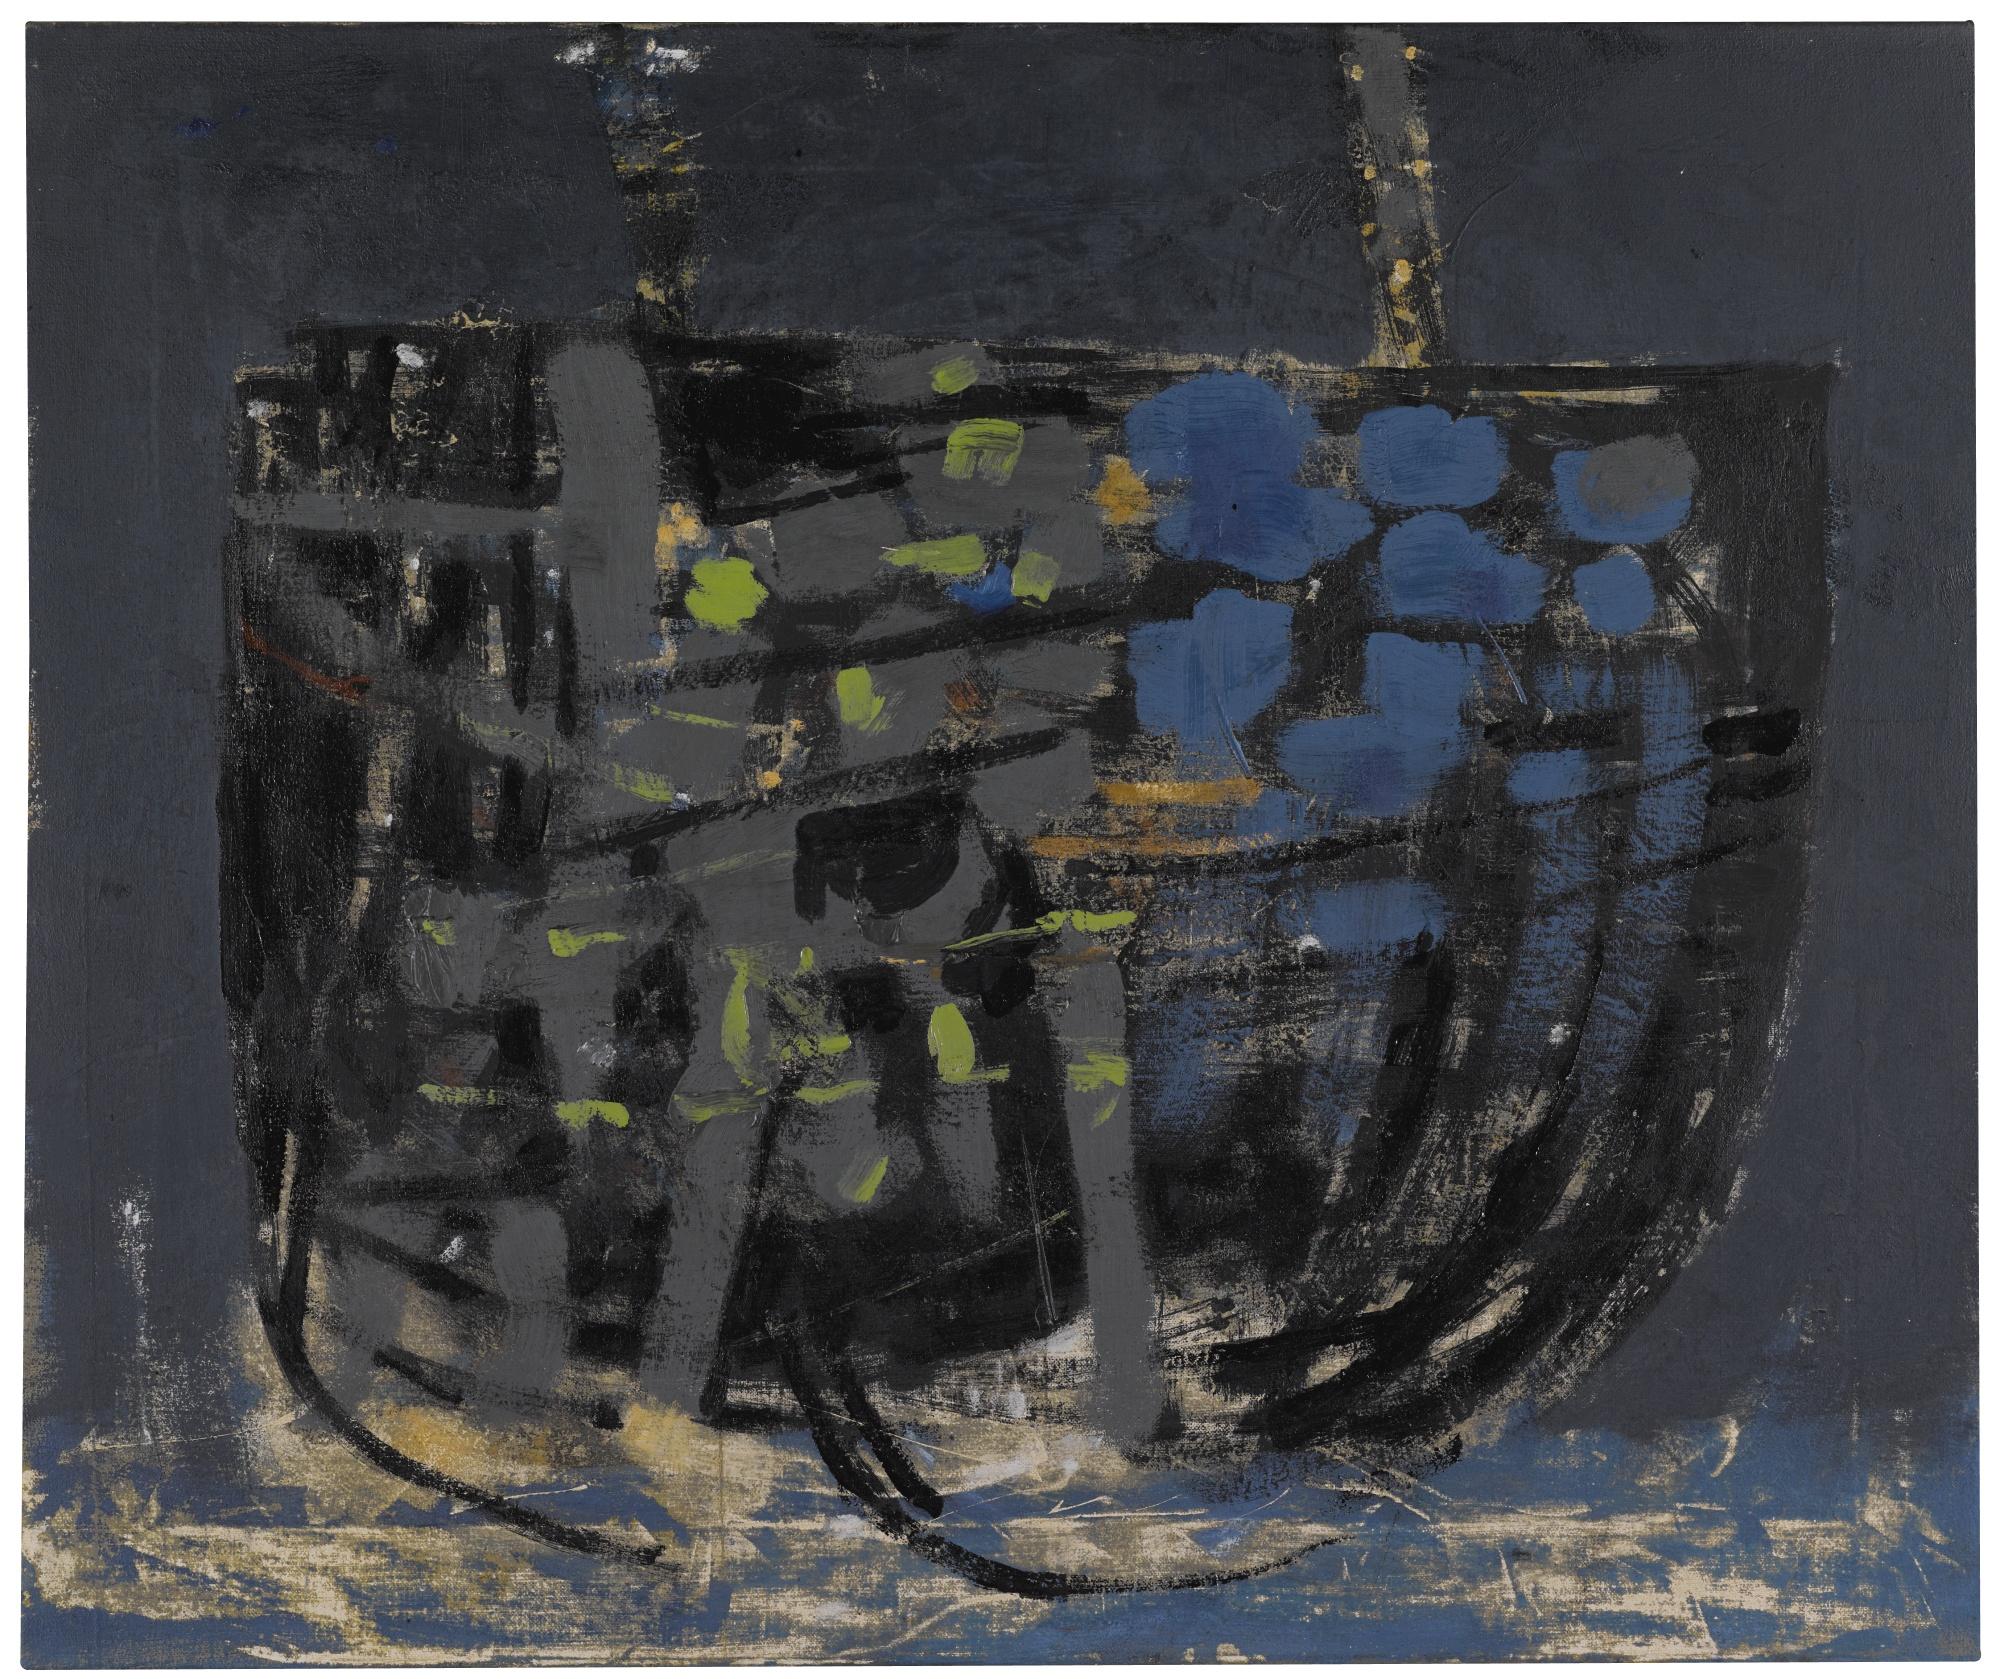 Roger Hilton-Bateau Ivre-1957